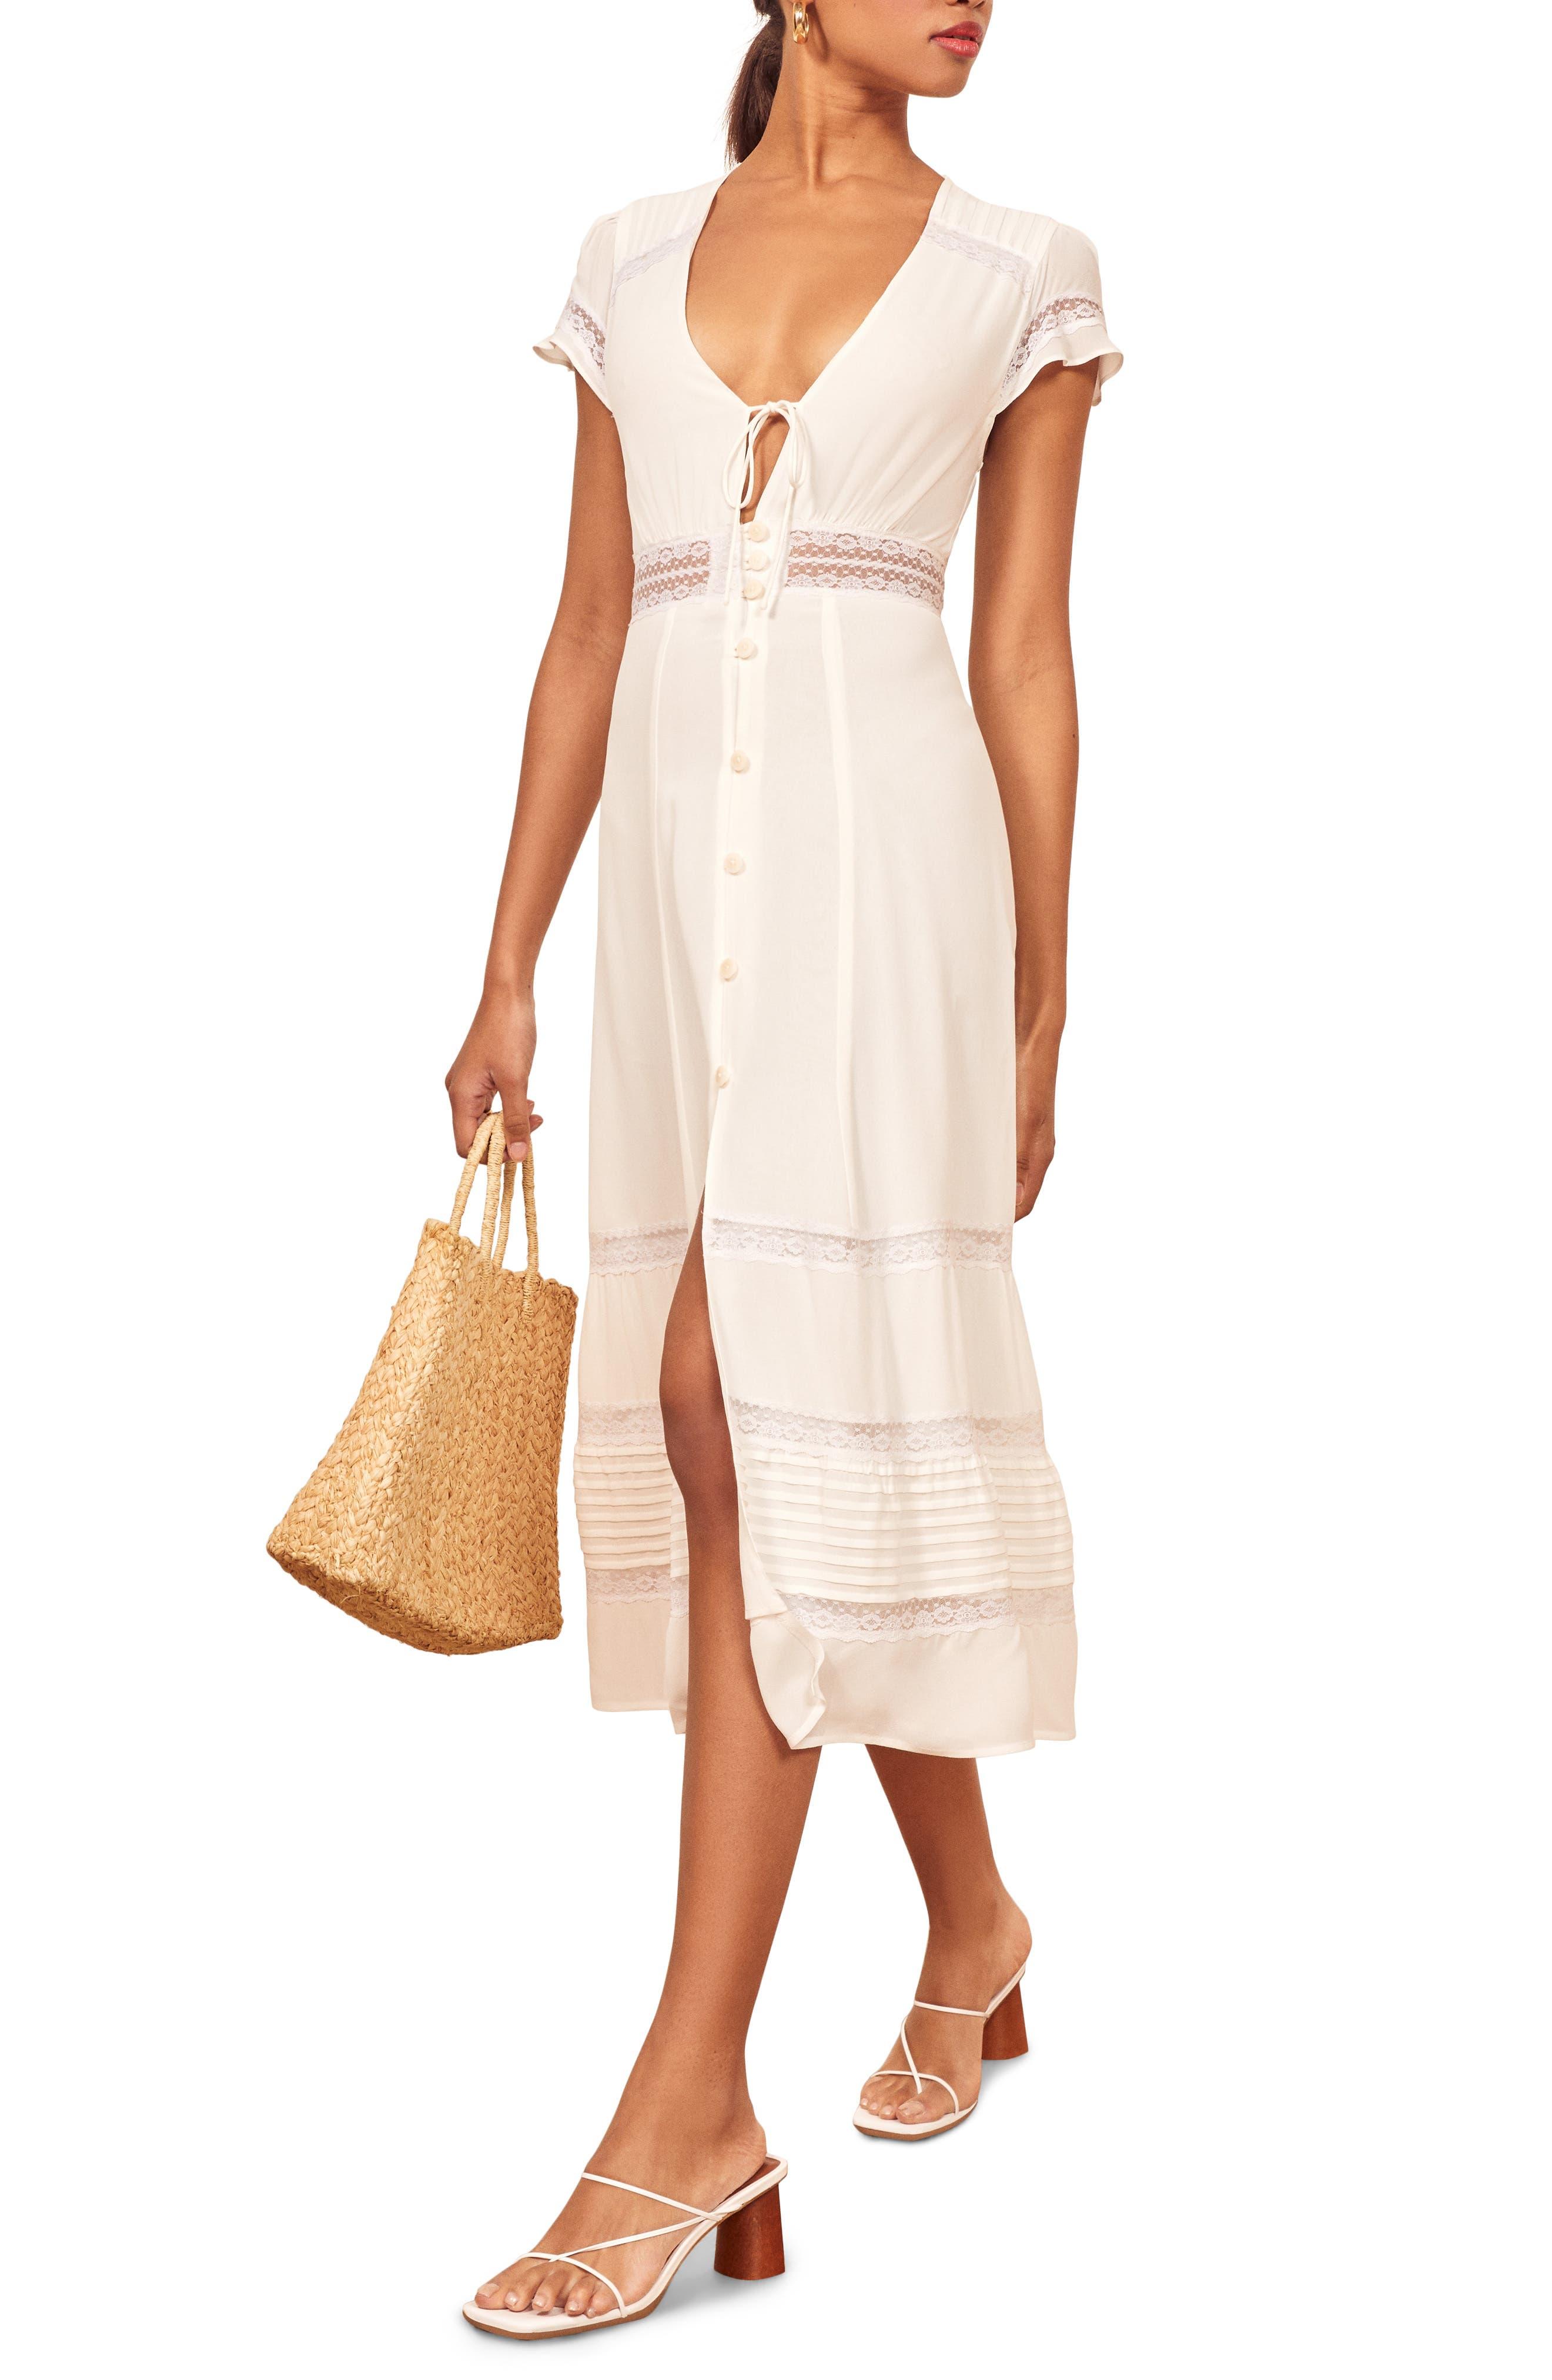 Reformation Garland Lace Trim Midi Dress, White